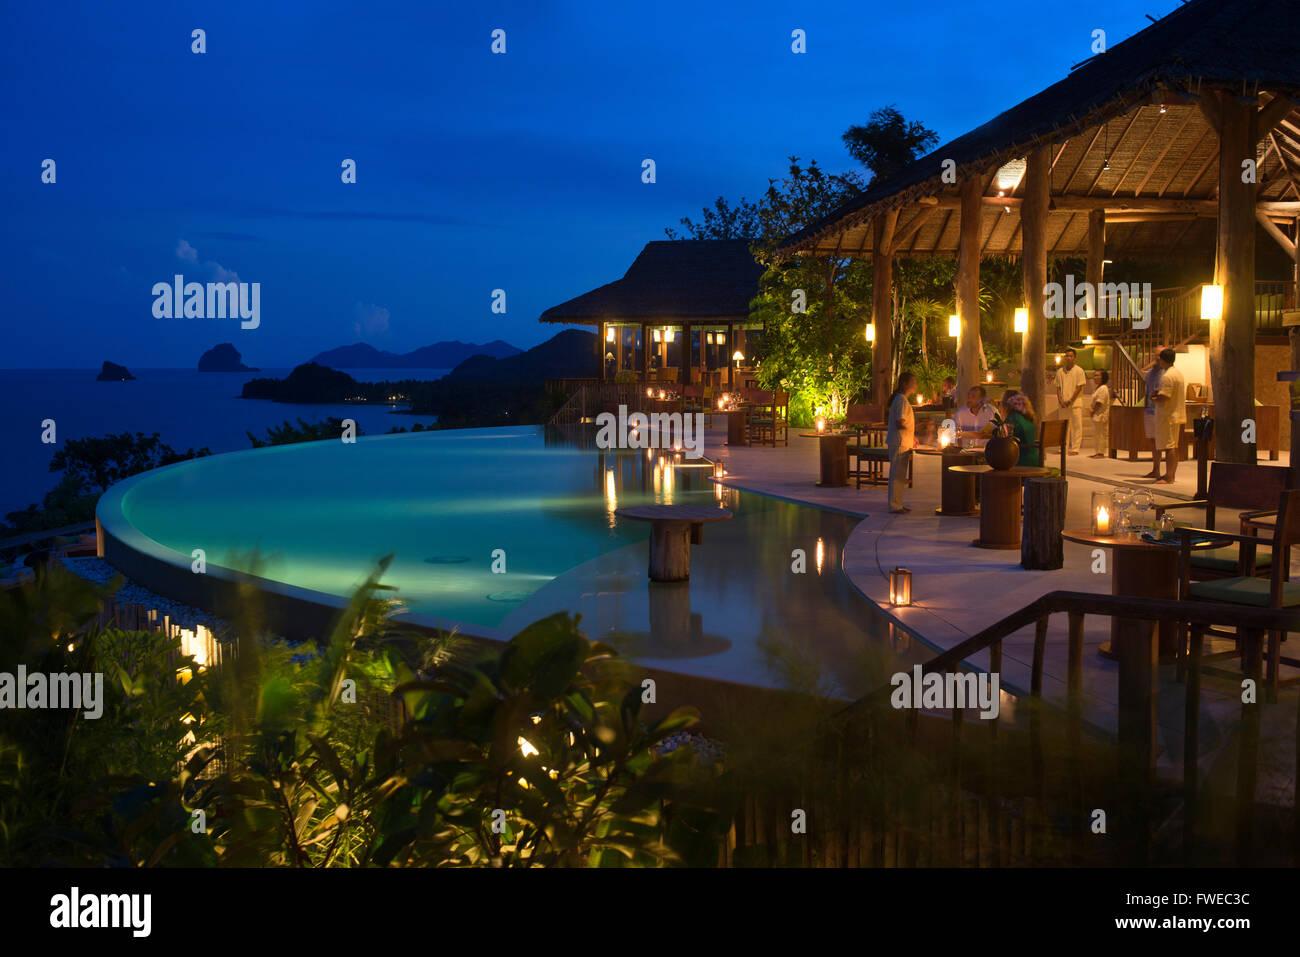 Six Senses Resort, Koh Yao Noi, Phang Nga Bay, en Thaïlande, en Asie. Restaurant près de la piscine appelée Photo Stock